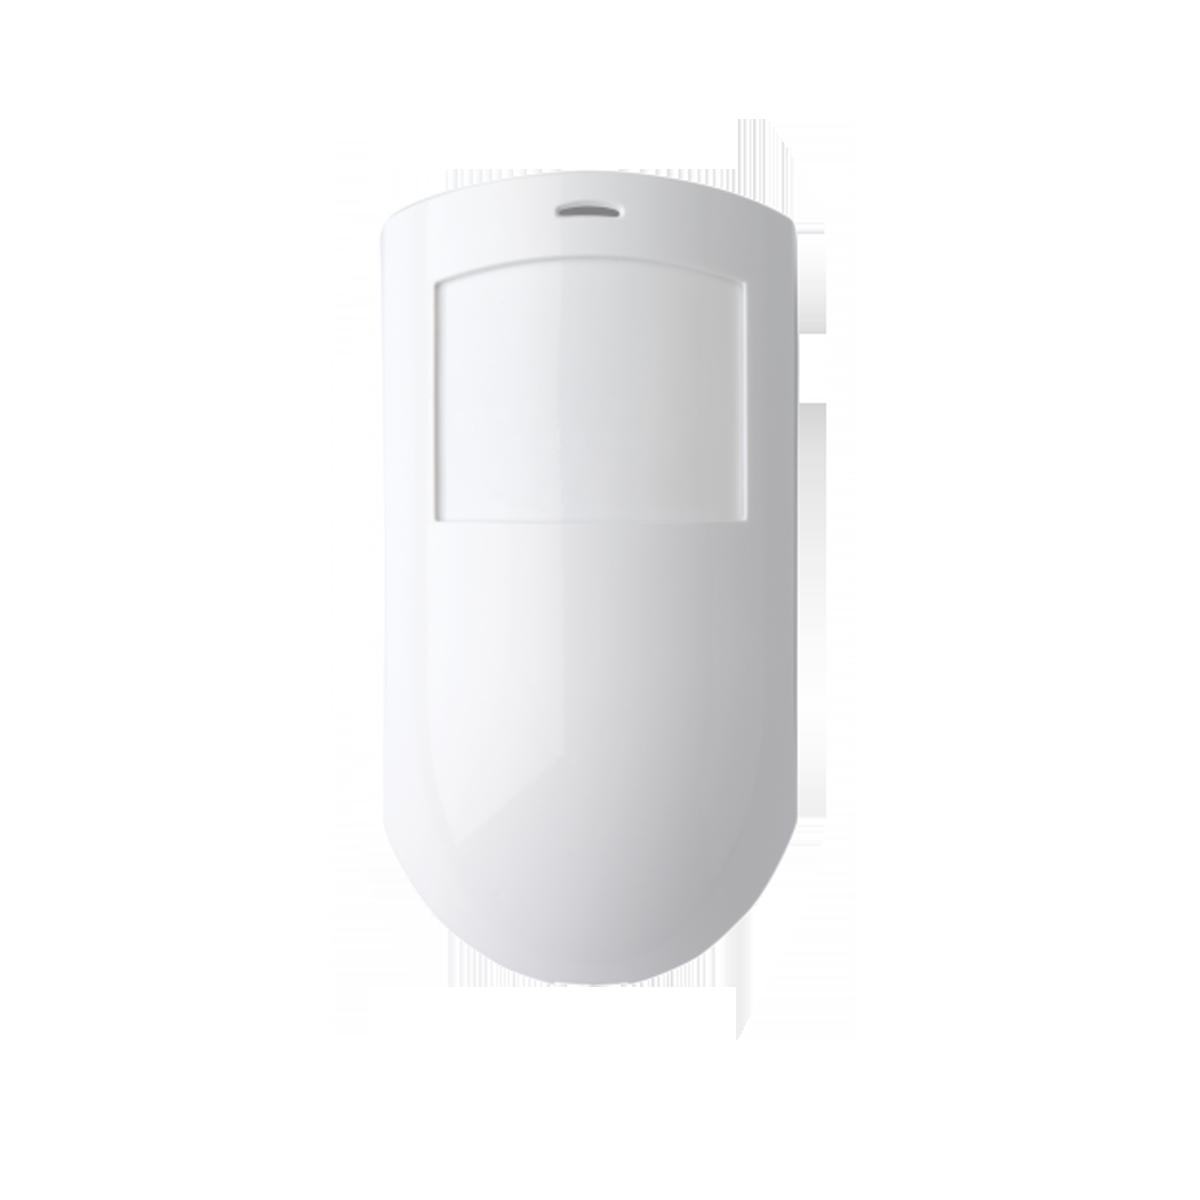 Detetor UTC/GUARDALL ANTI-Máscara G3